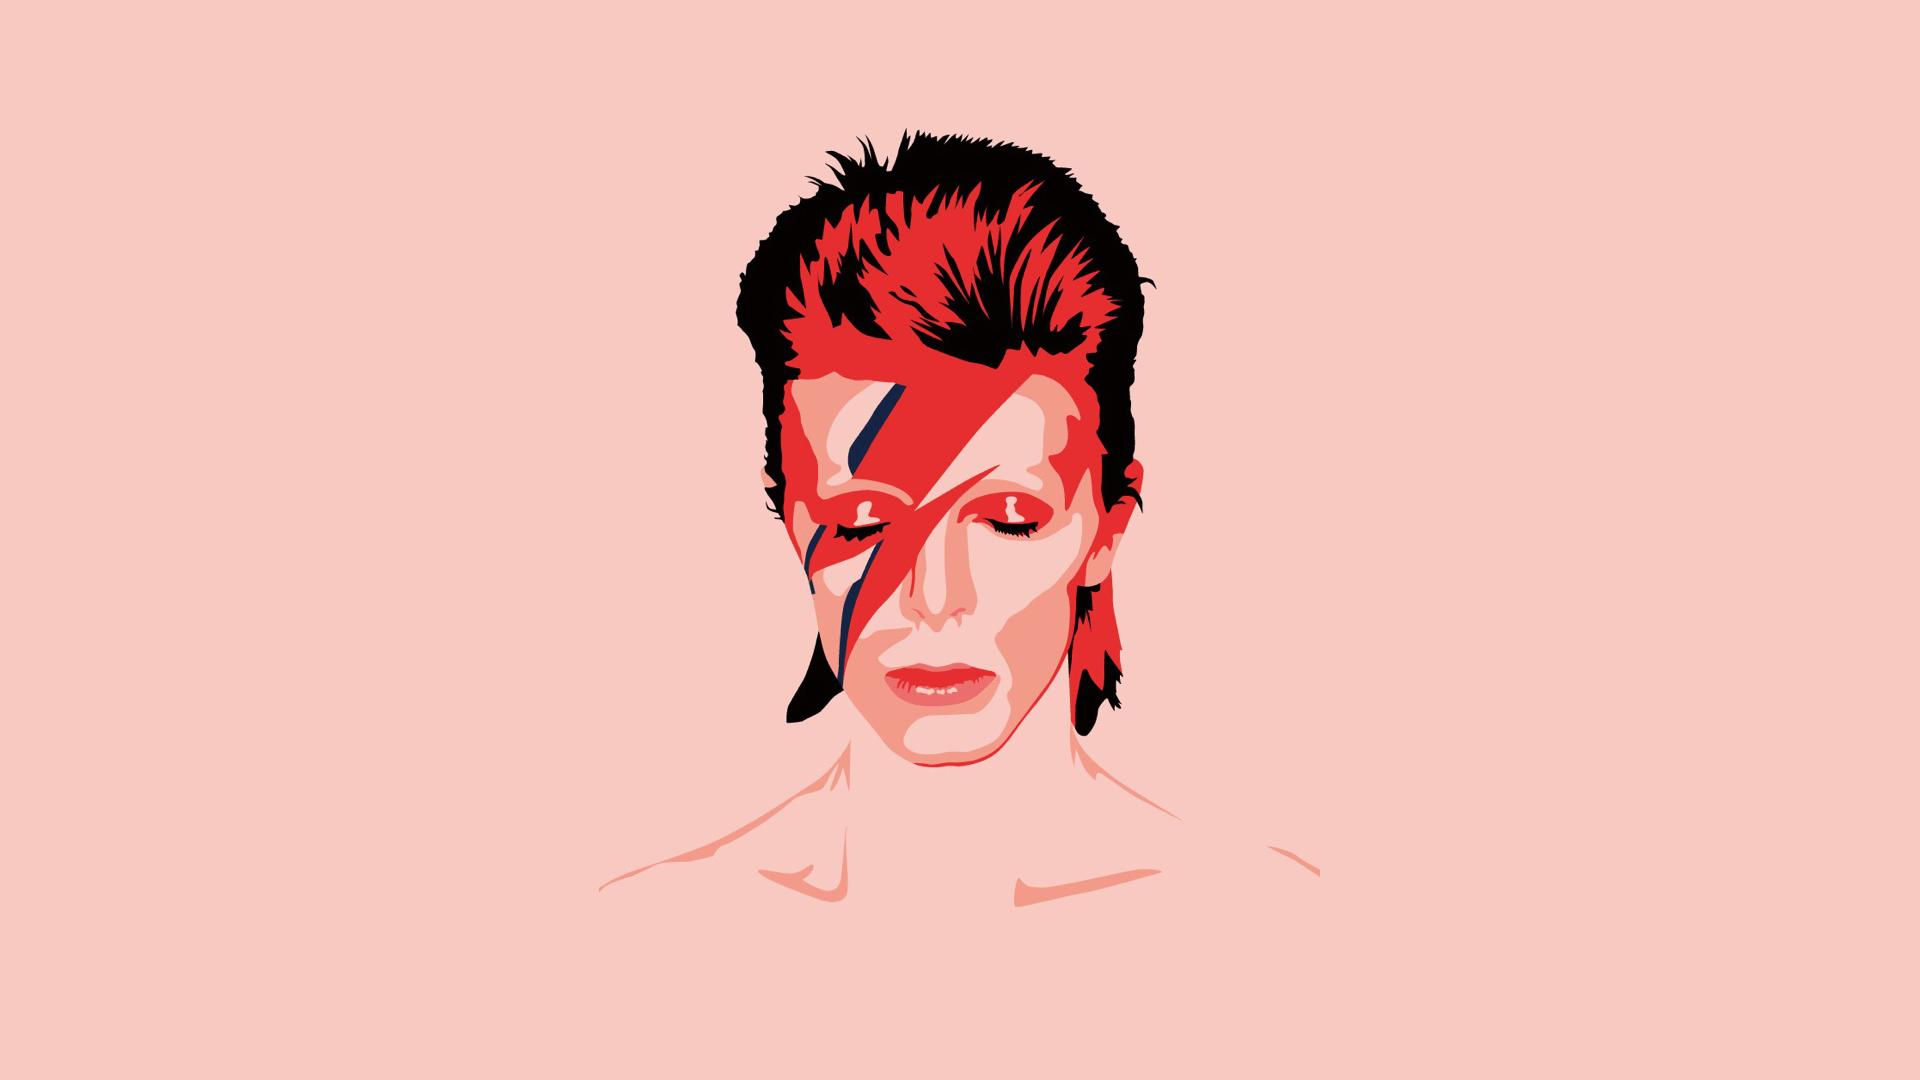 Rise And Fall Of Ziggy Stardust Wallpaper 1920x1080 David Bowie Wallpaper For Desktop Pixelstalk Net